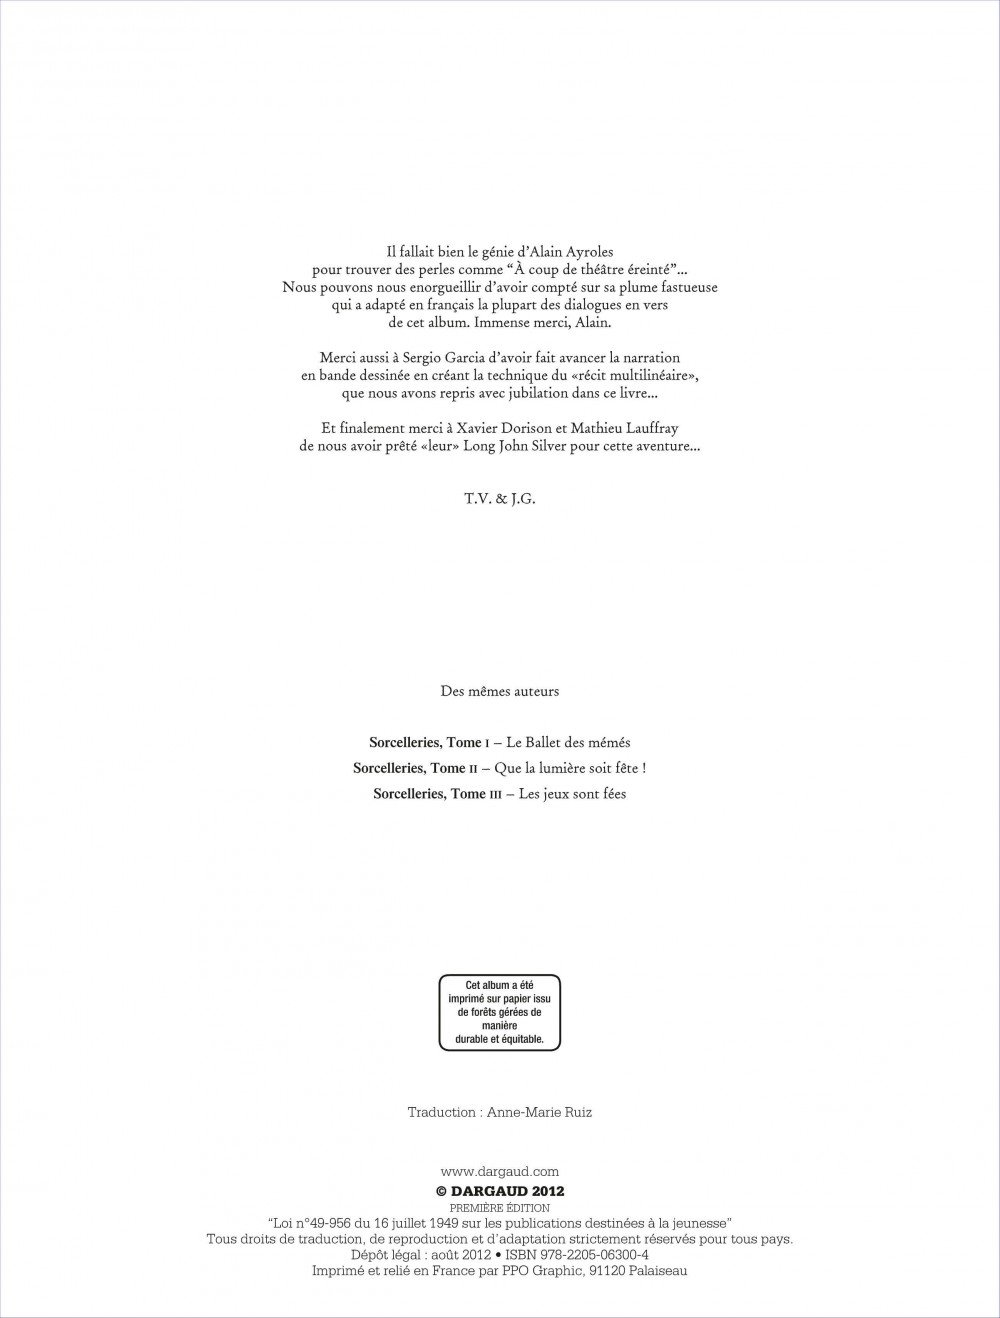 Sorcelleries Tome 3 Les Jeux Sont Fees Sorcelleries 3 French Edition Valero Teresa Guarnido Juanjo 9782205063004 Amazon Com Books